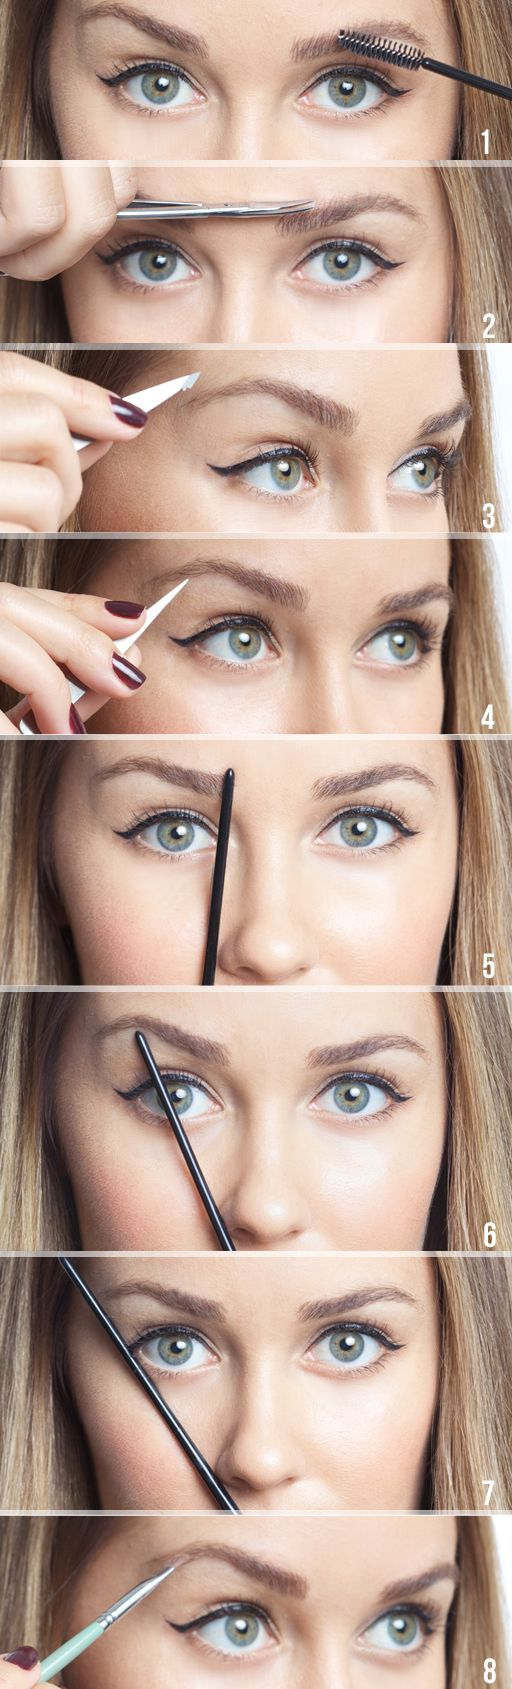 Eyebrow Tweeze! | thebeautyspotqld.com.au